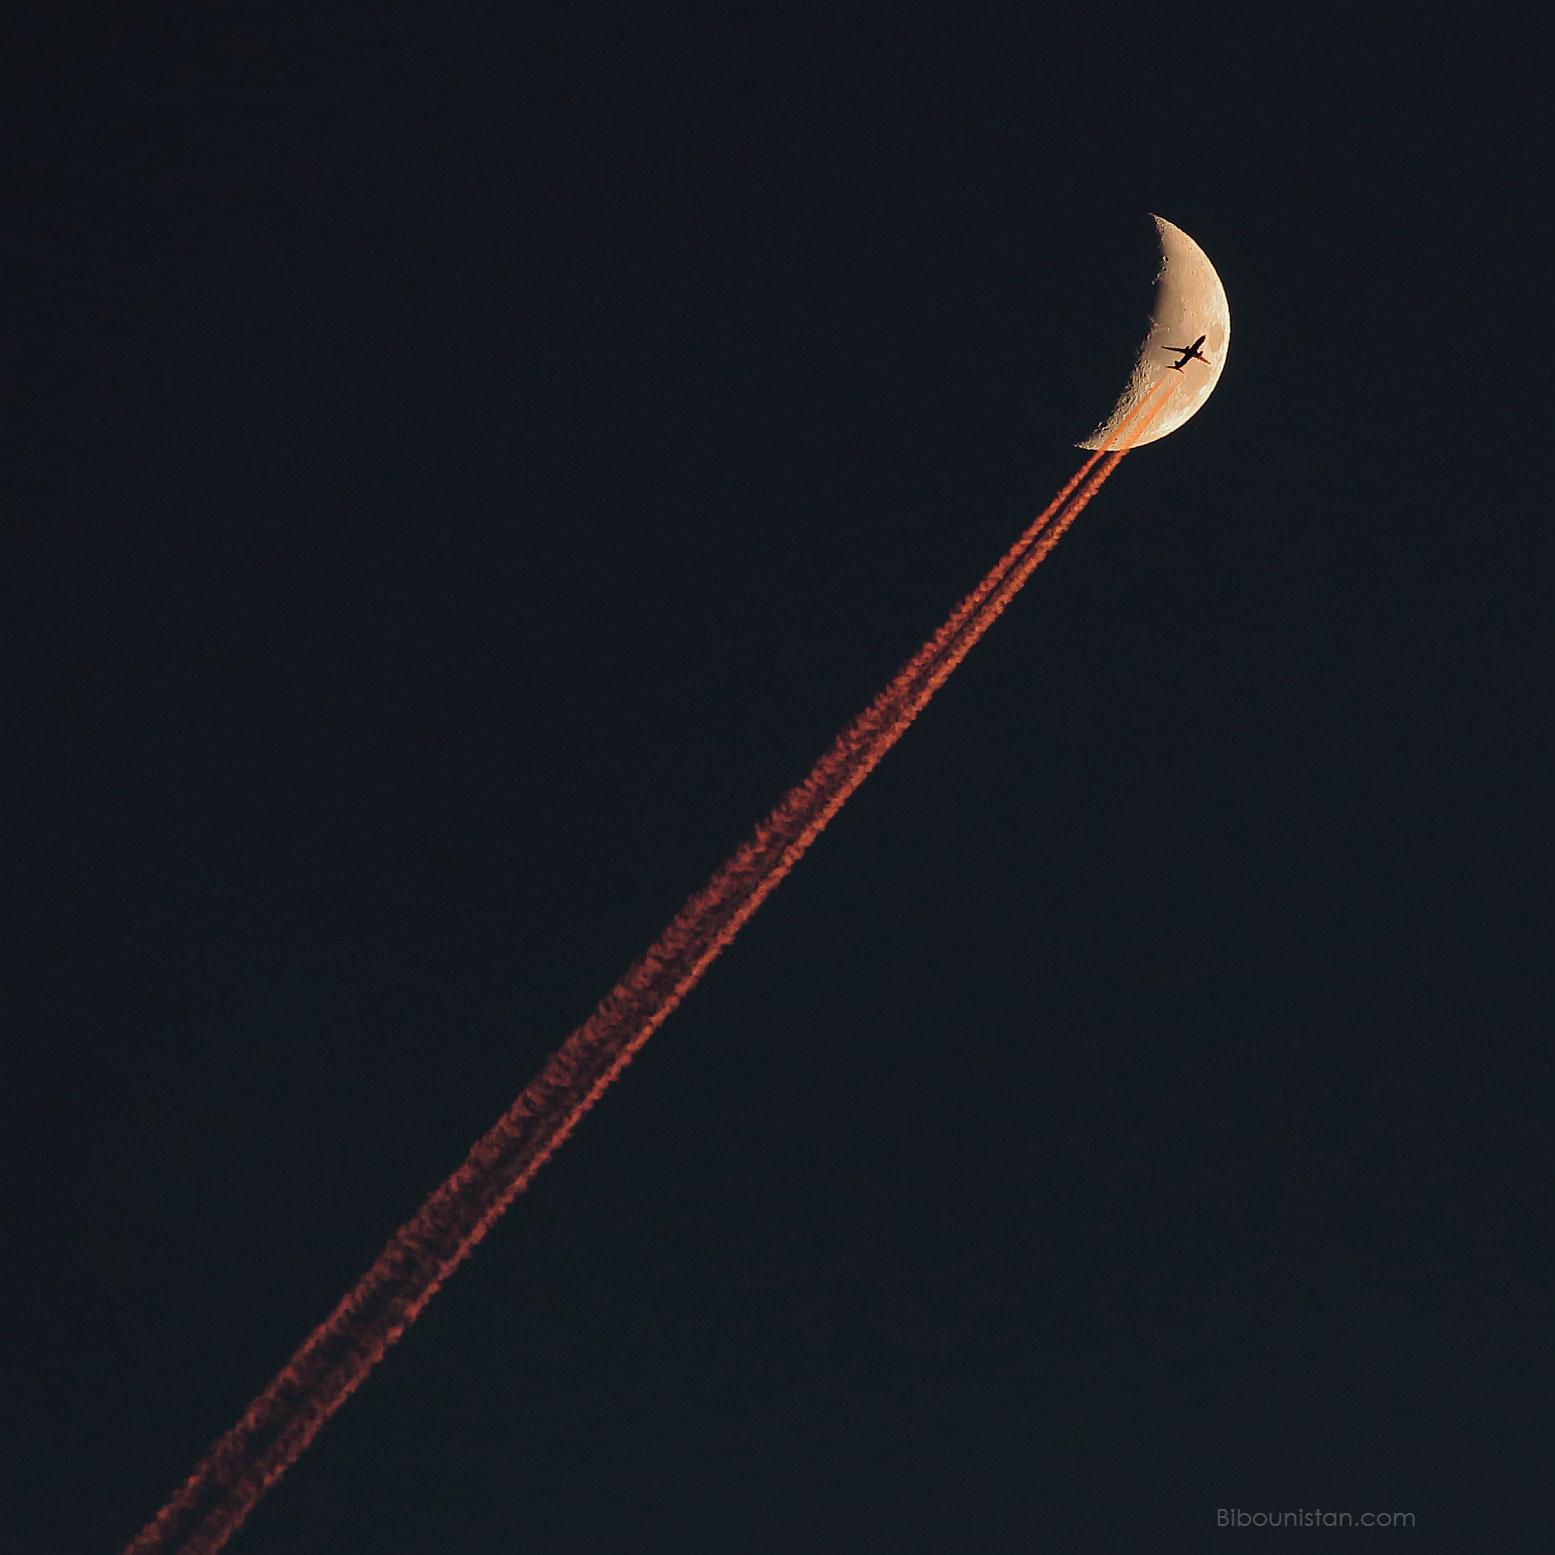 Plane Crossing a Crescent Moon